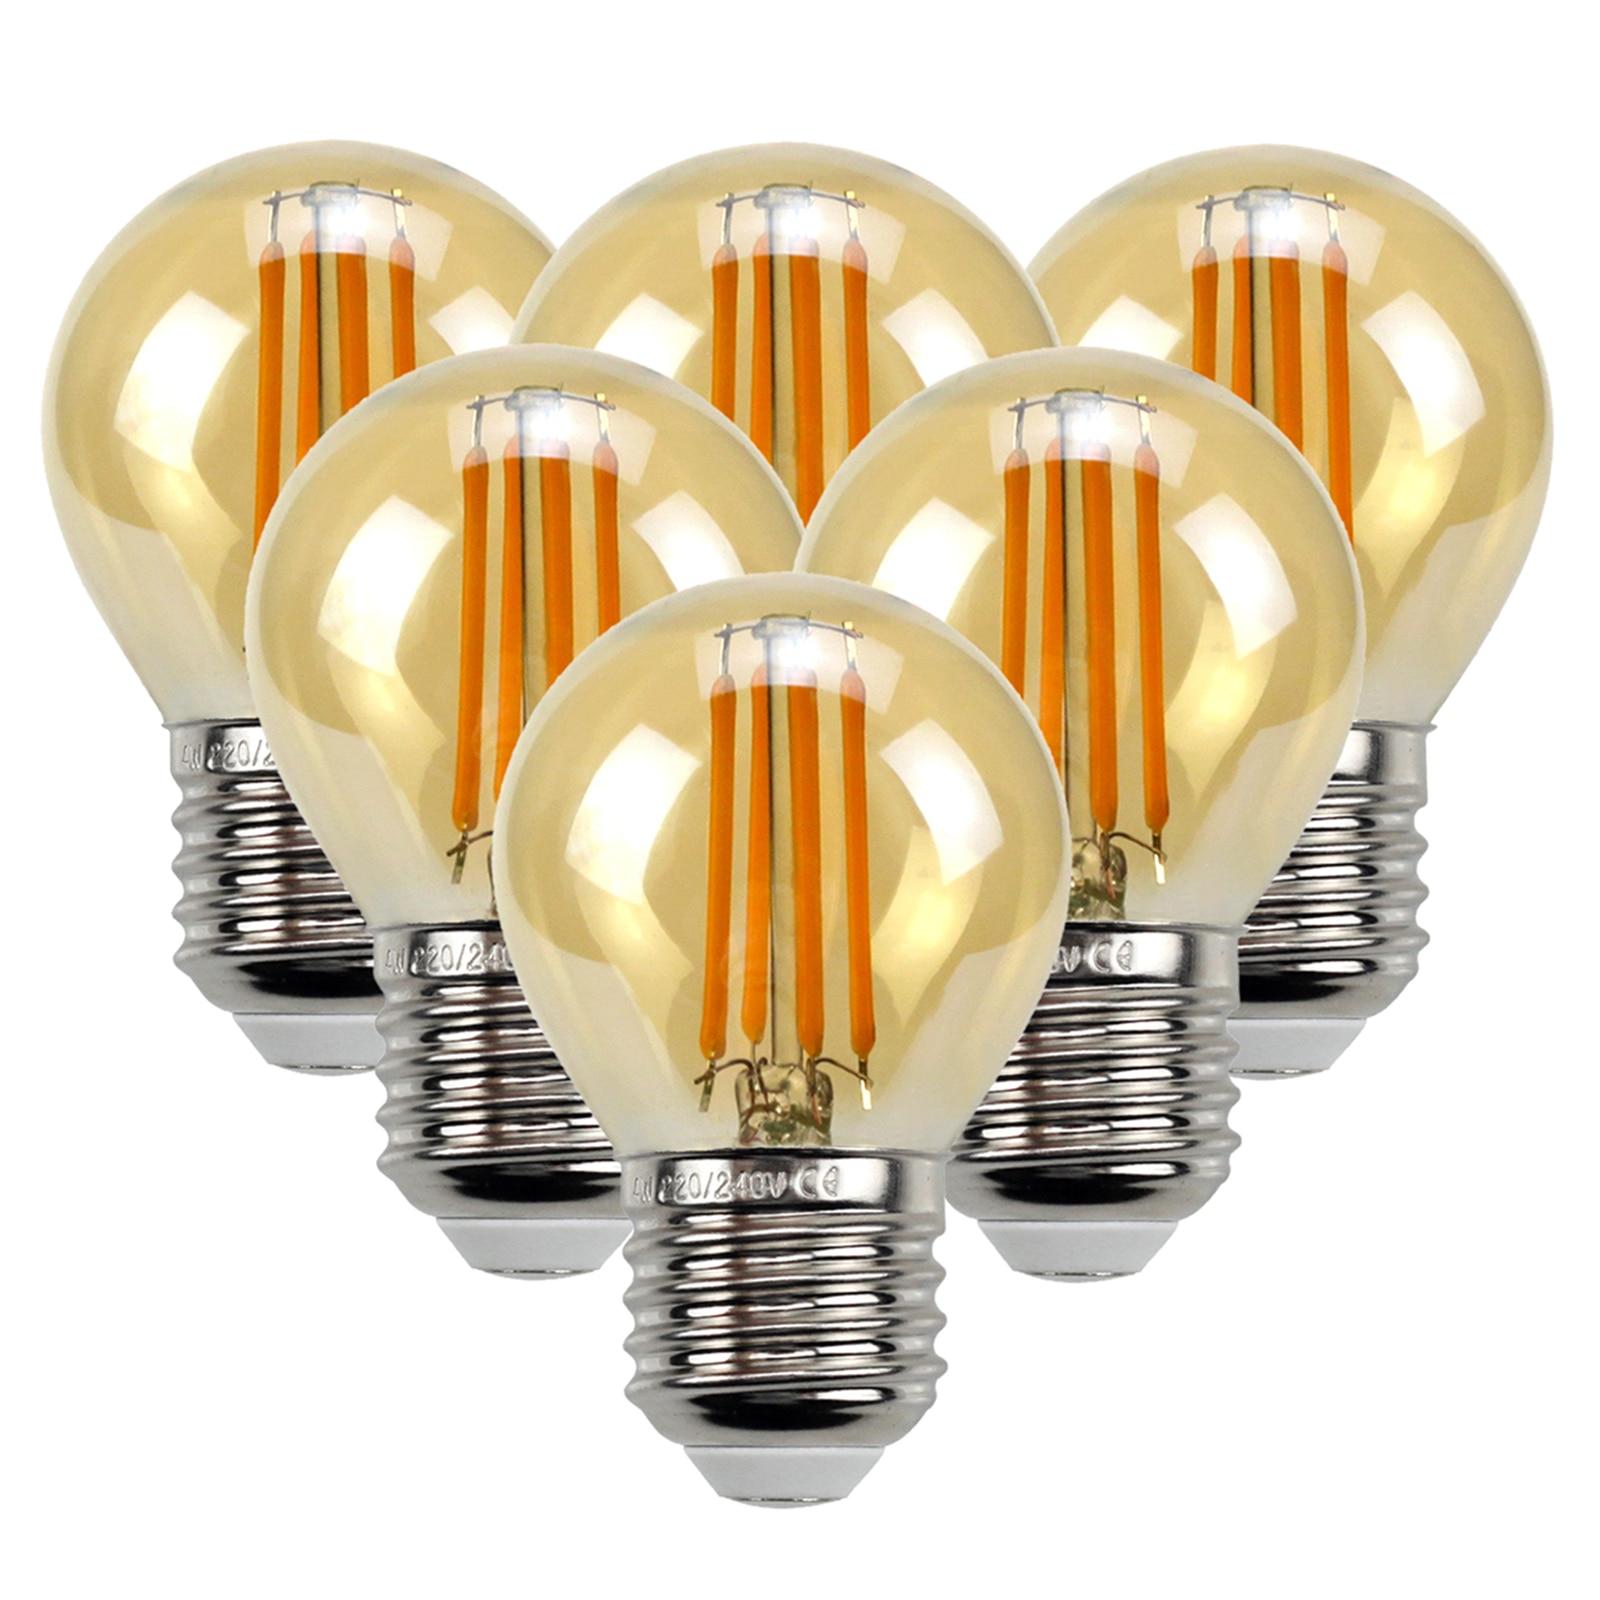 6 pcs edison lampadas branco quente 4w 04